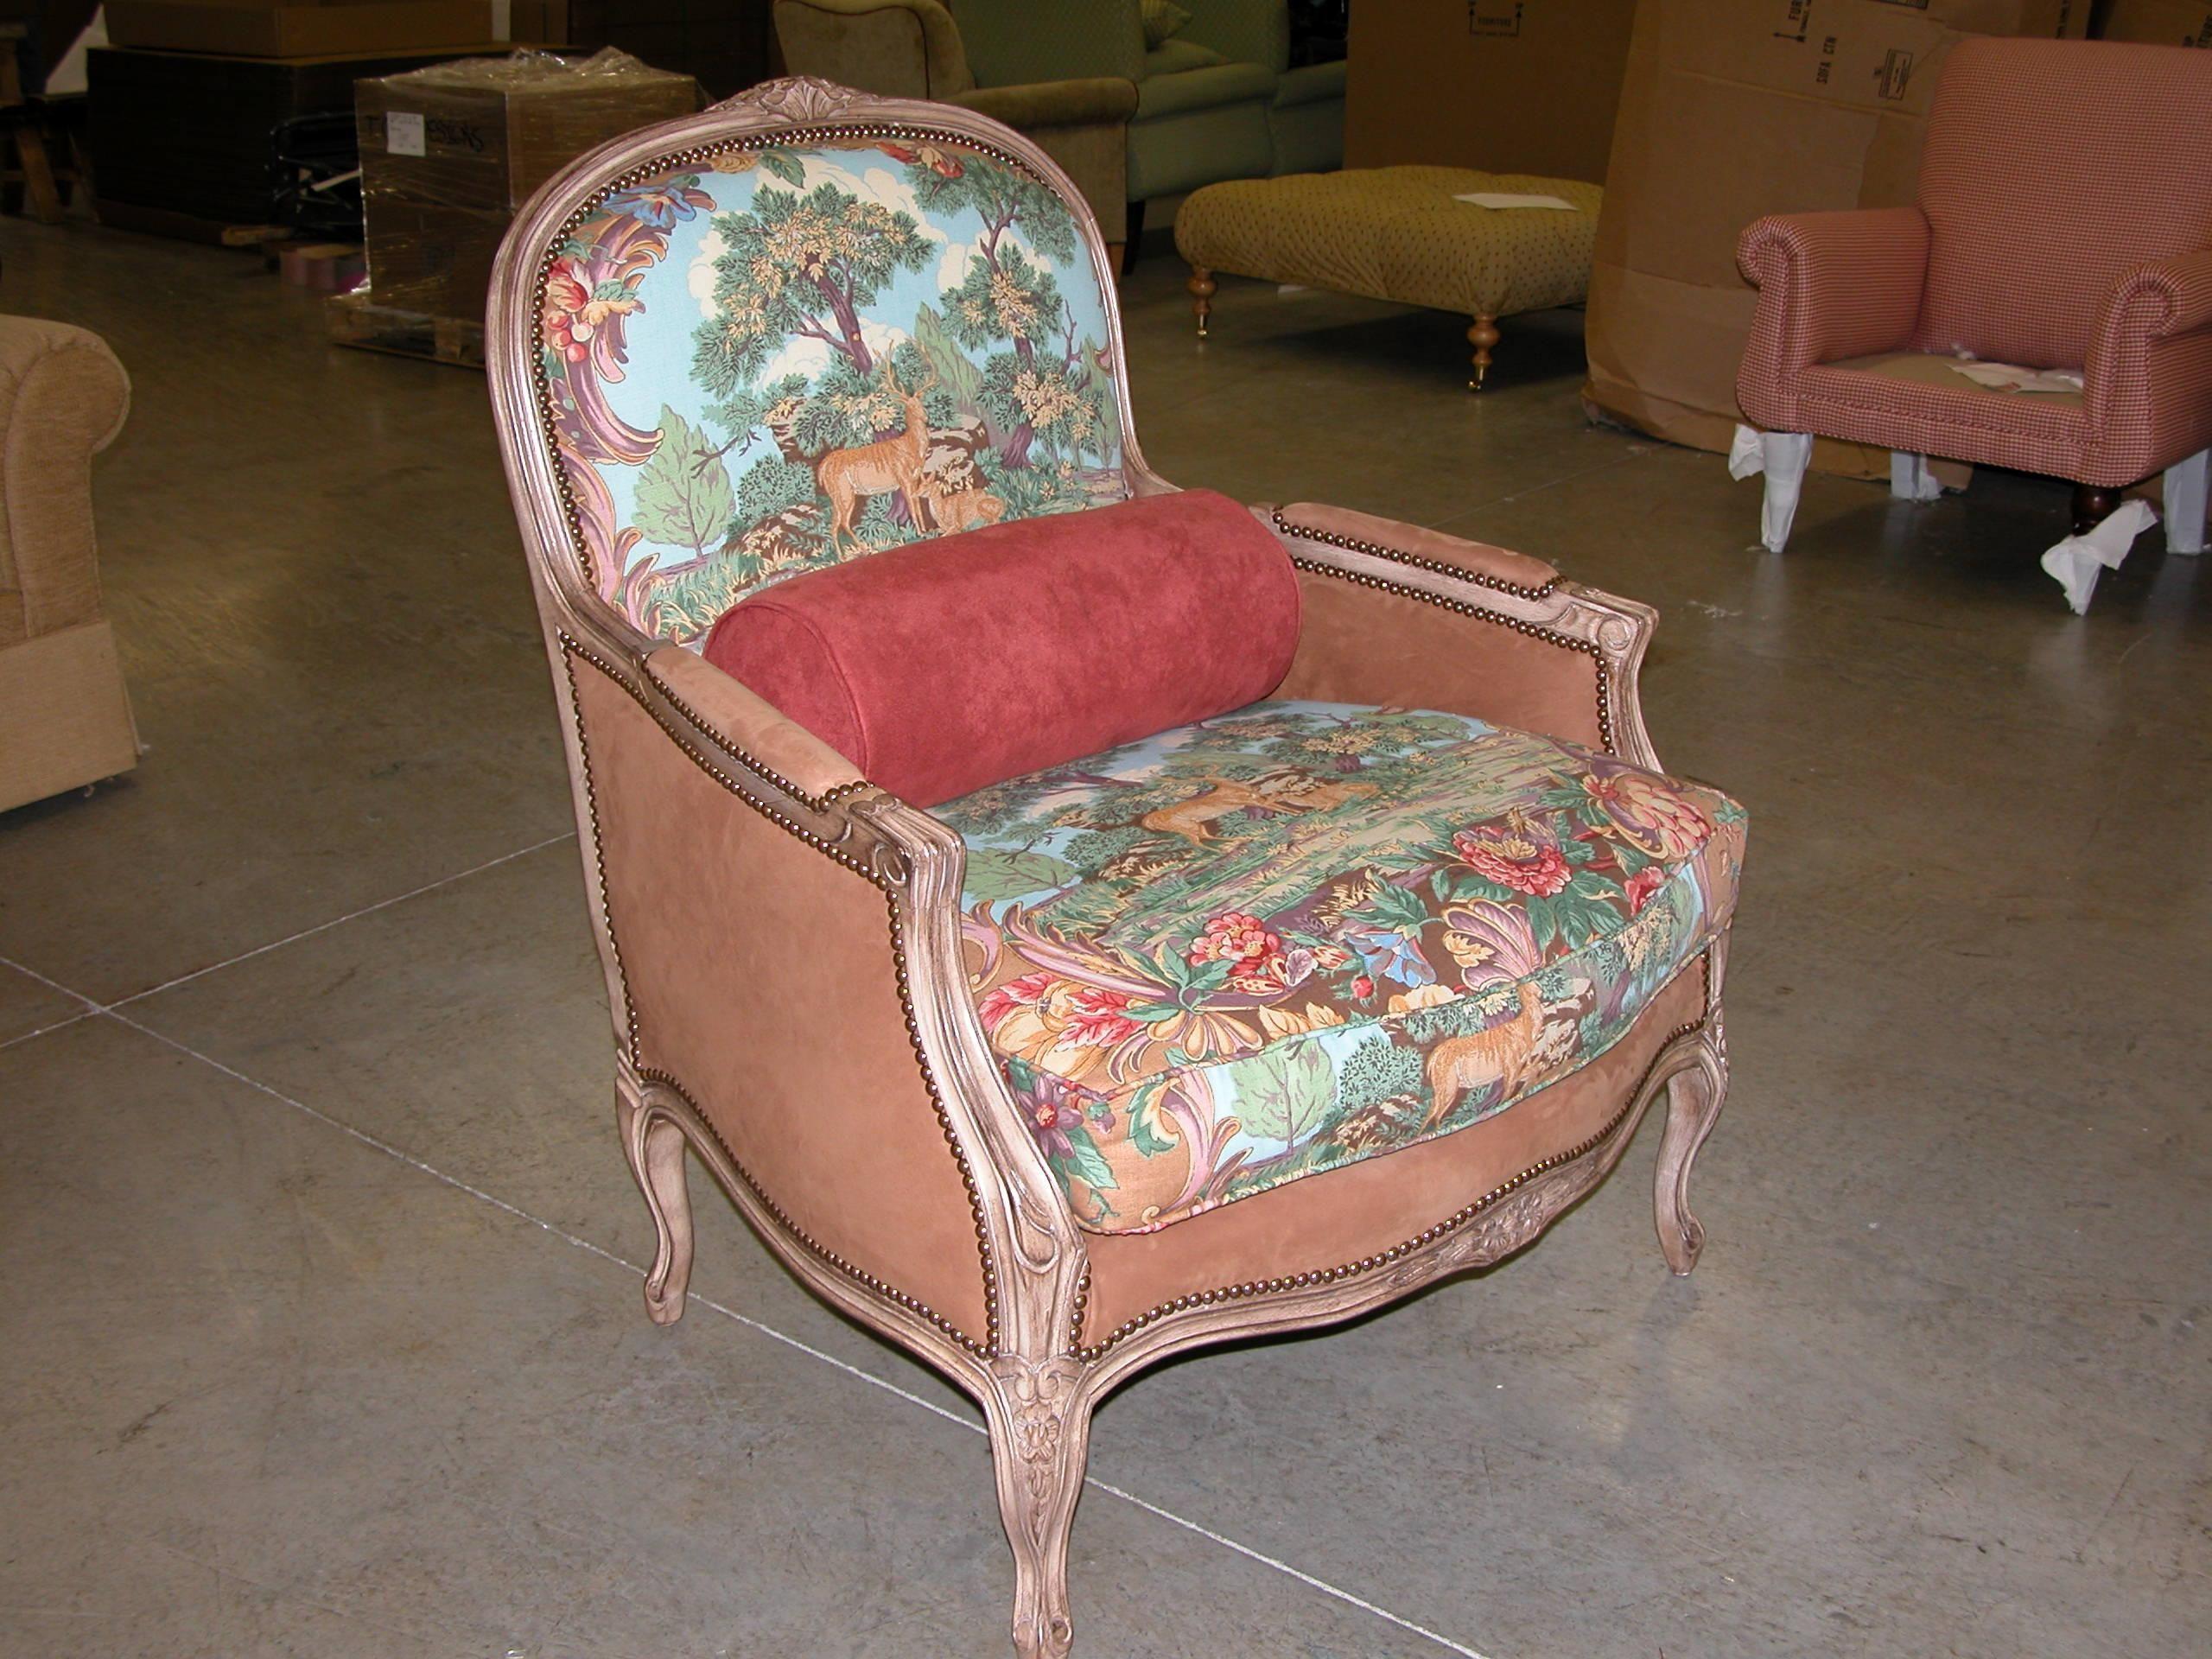 Laurels Favorite Com Upholstery Tcs Designs Inc Furniture Companies Ottomans Sofas